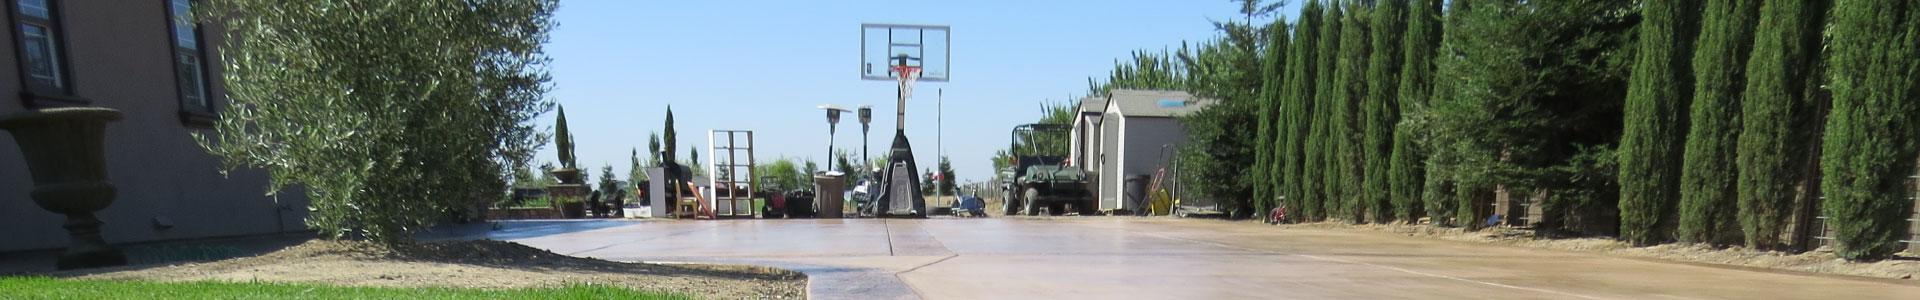 Concrete driveways, patios, and tennis courts